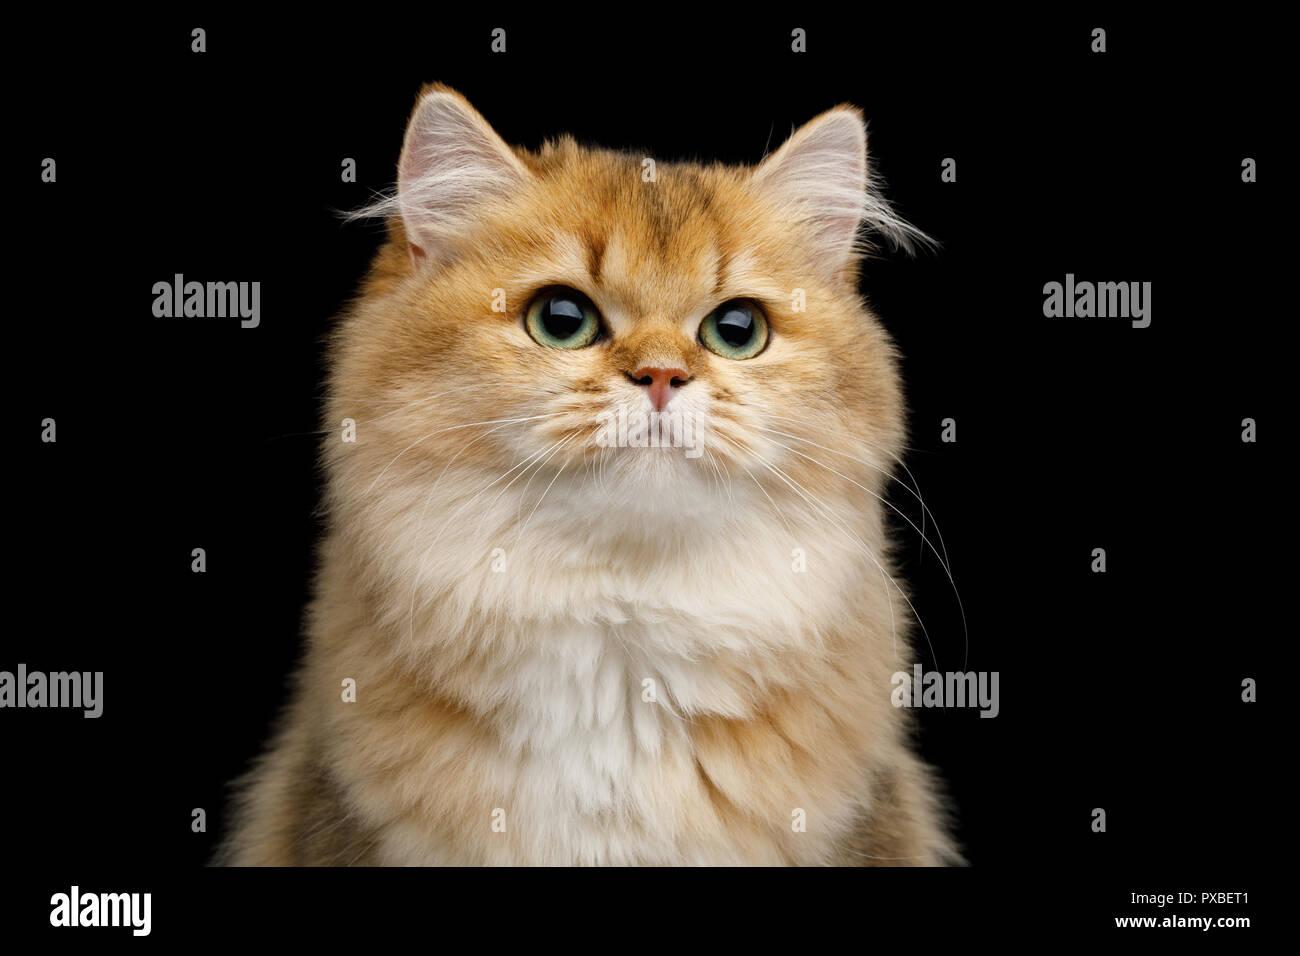 Retrato de Británico gato color rojo con ojos verdes dreamily busca sobre fondo negro aislado Imagen De Stock